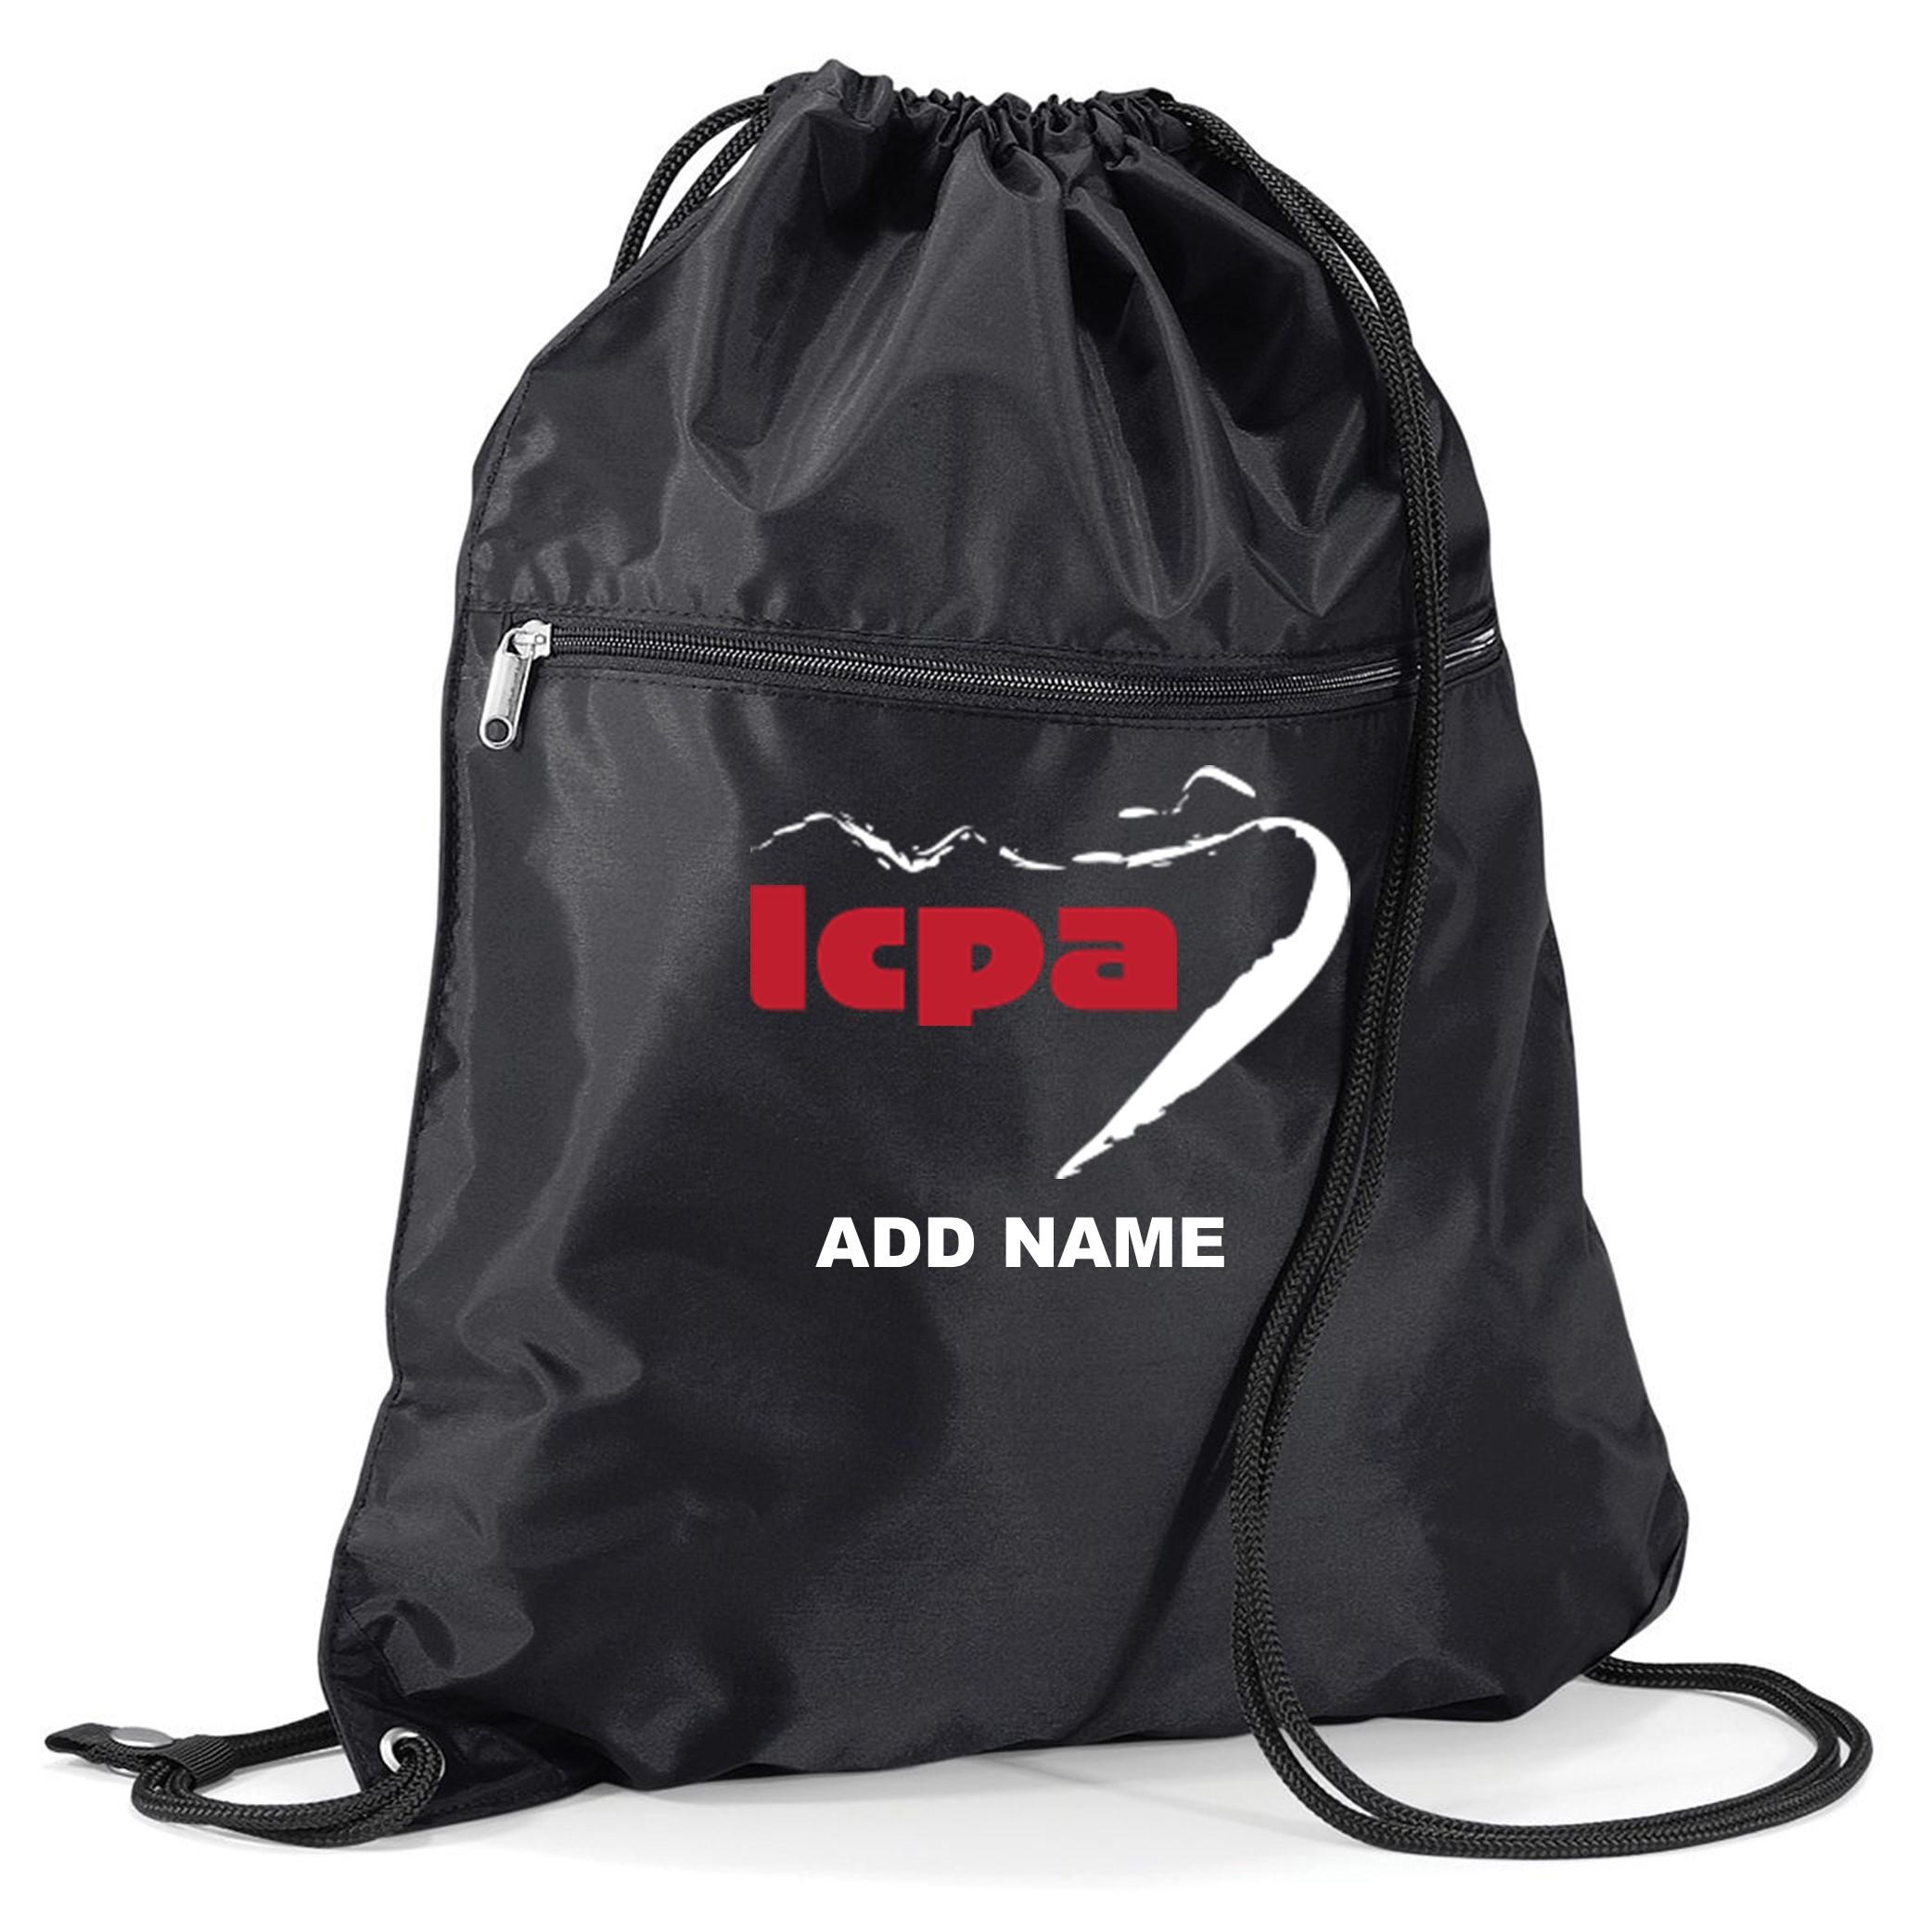 LCPA-015 PREMIUM SHOWERPROOF ZIPPED PULL CORD GYM BAG